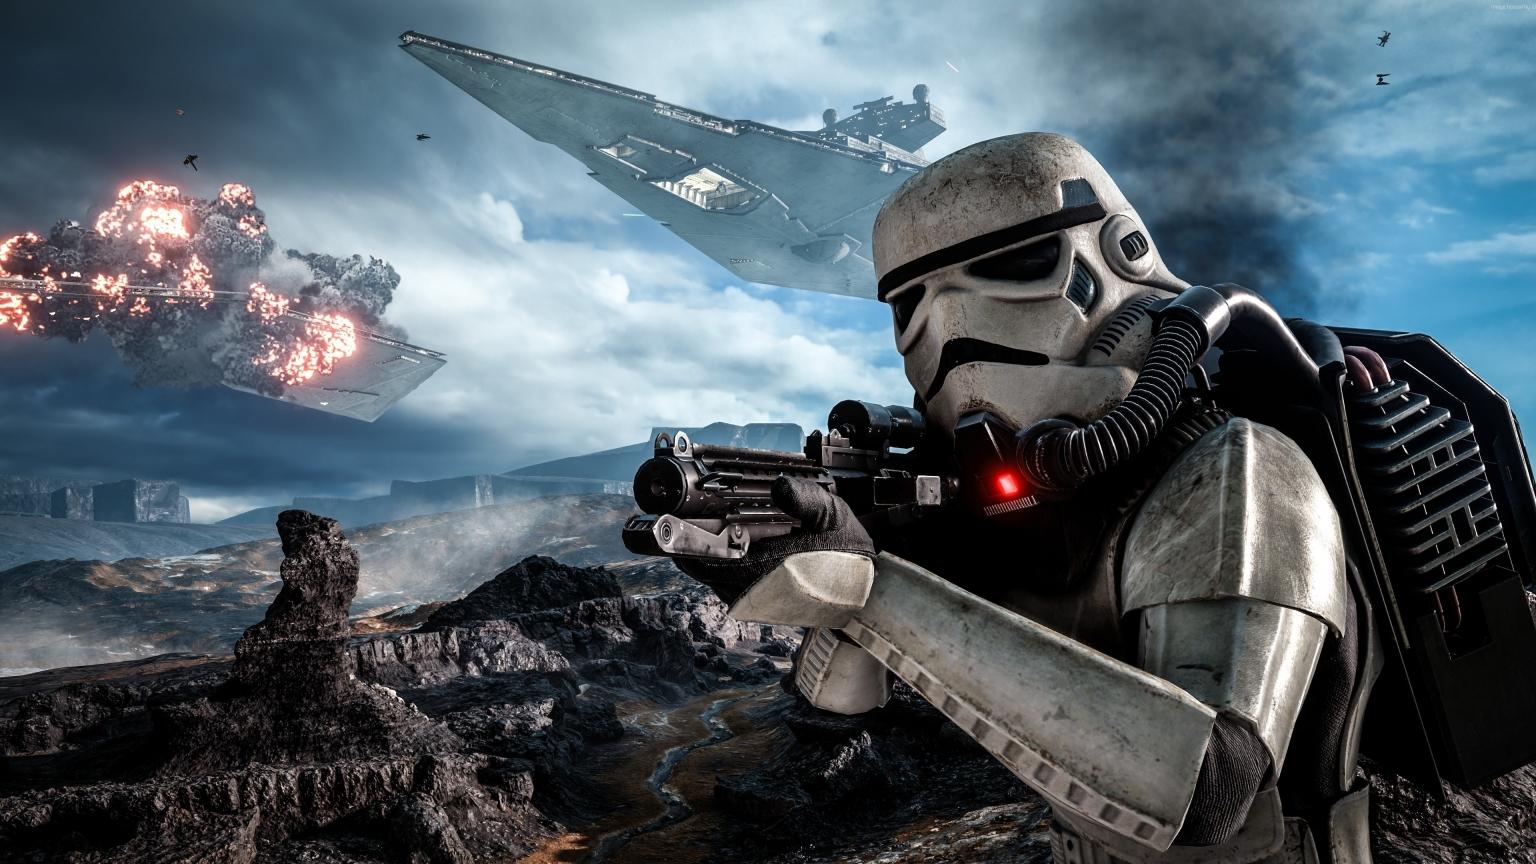 Star Wars Battlefront 2016 1536 X 864 Hdtv Wallpaper